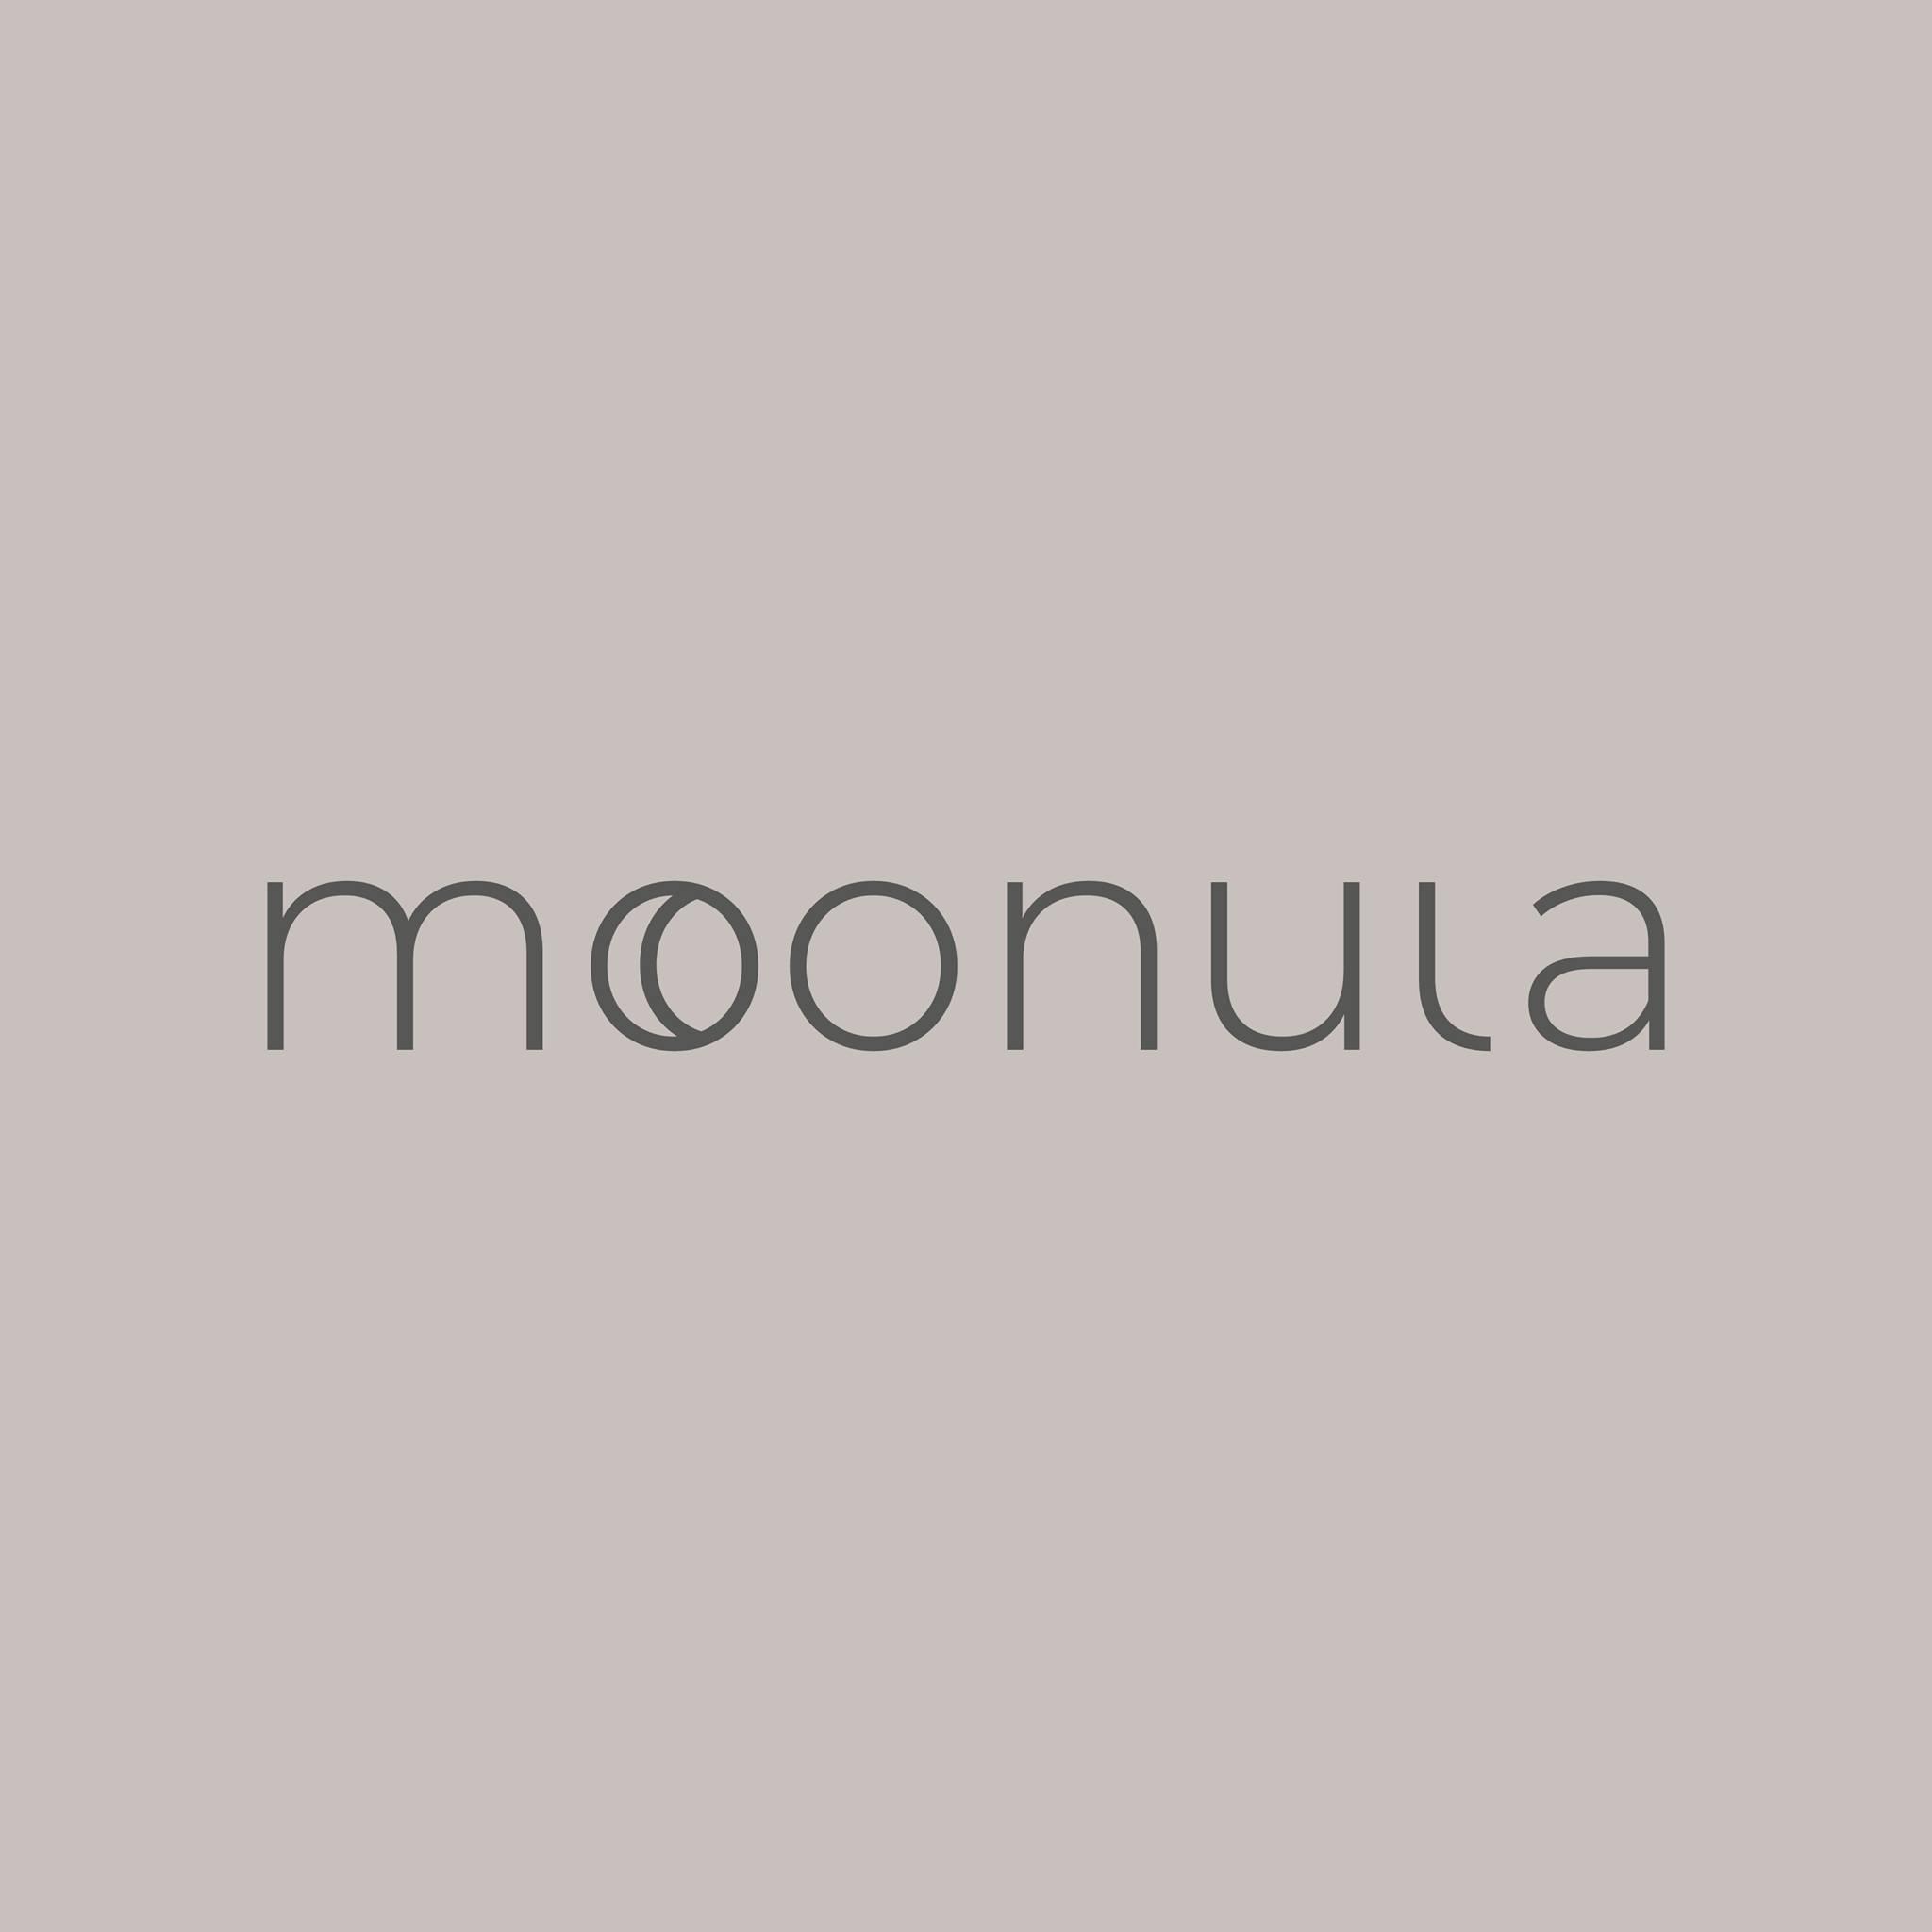 moonula